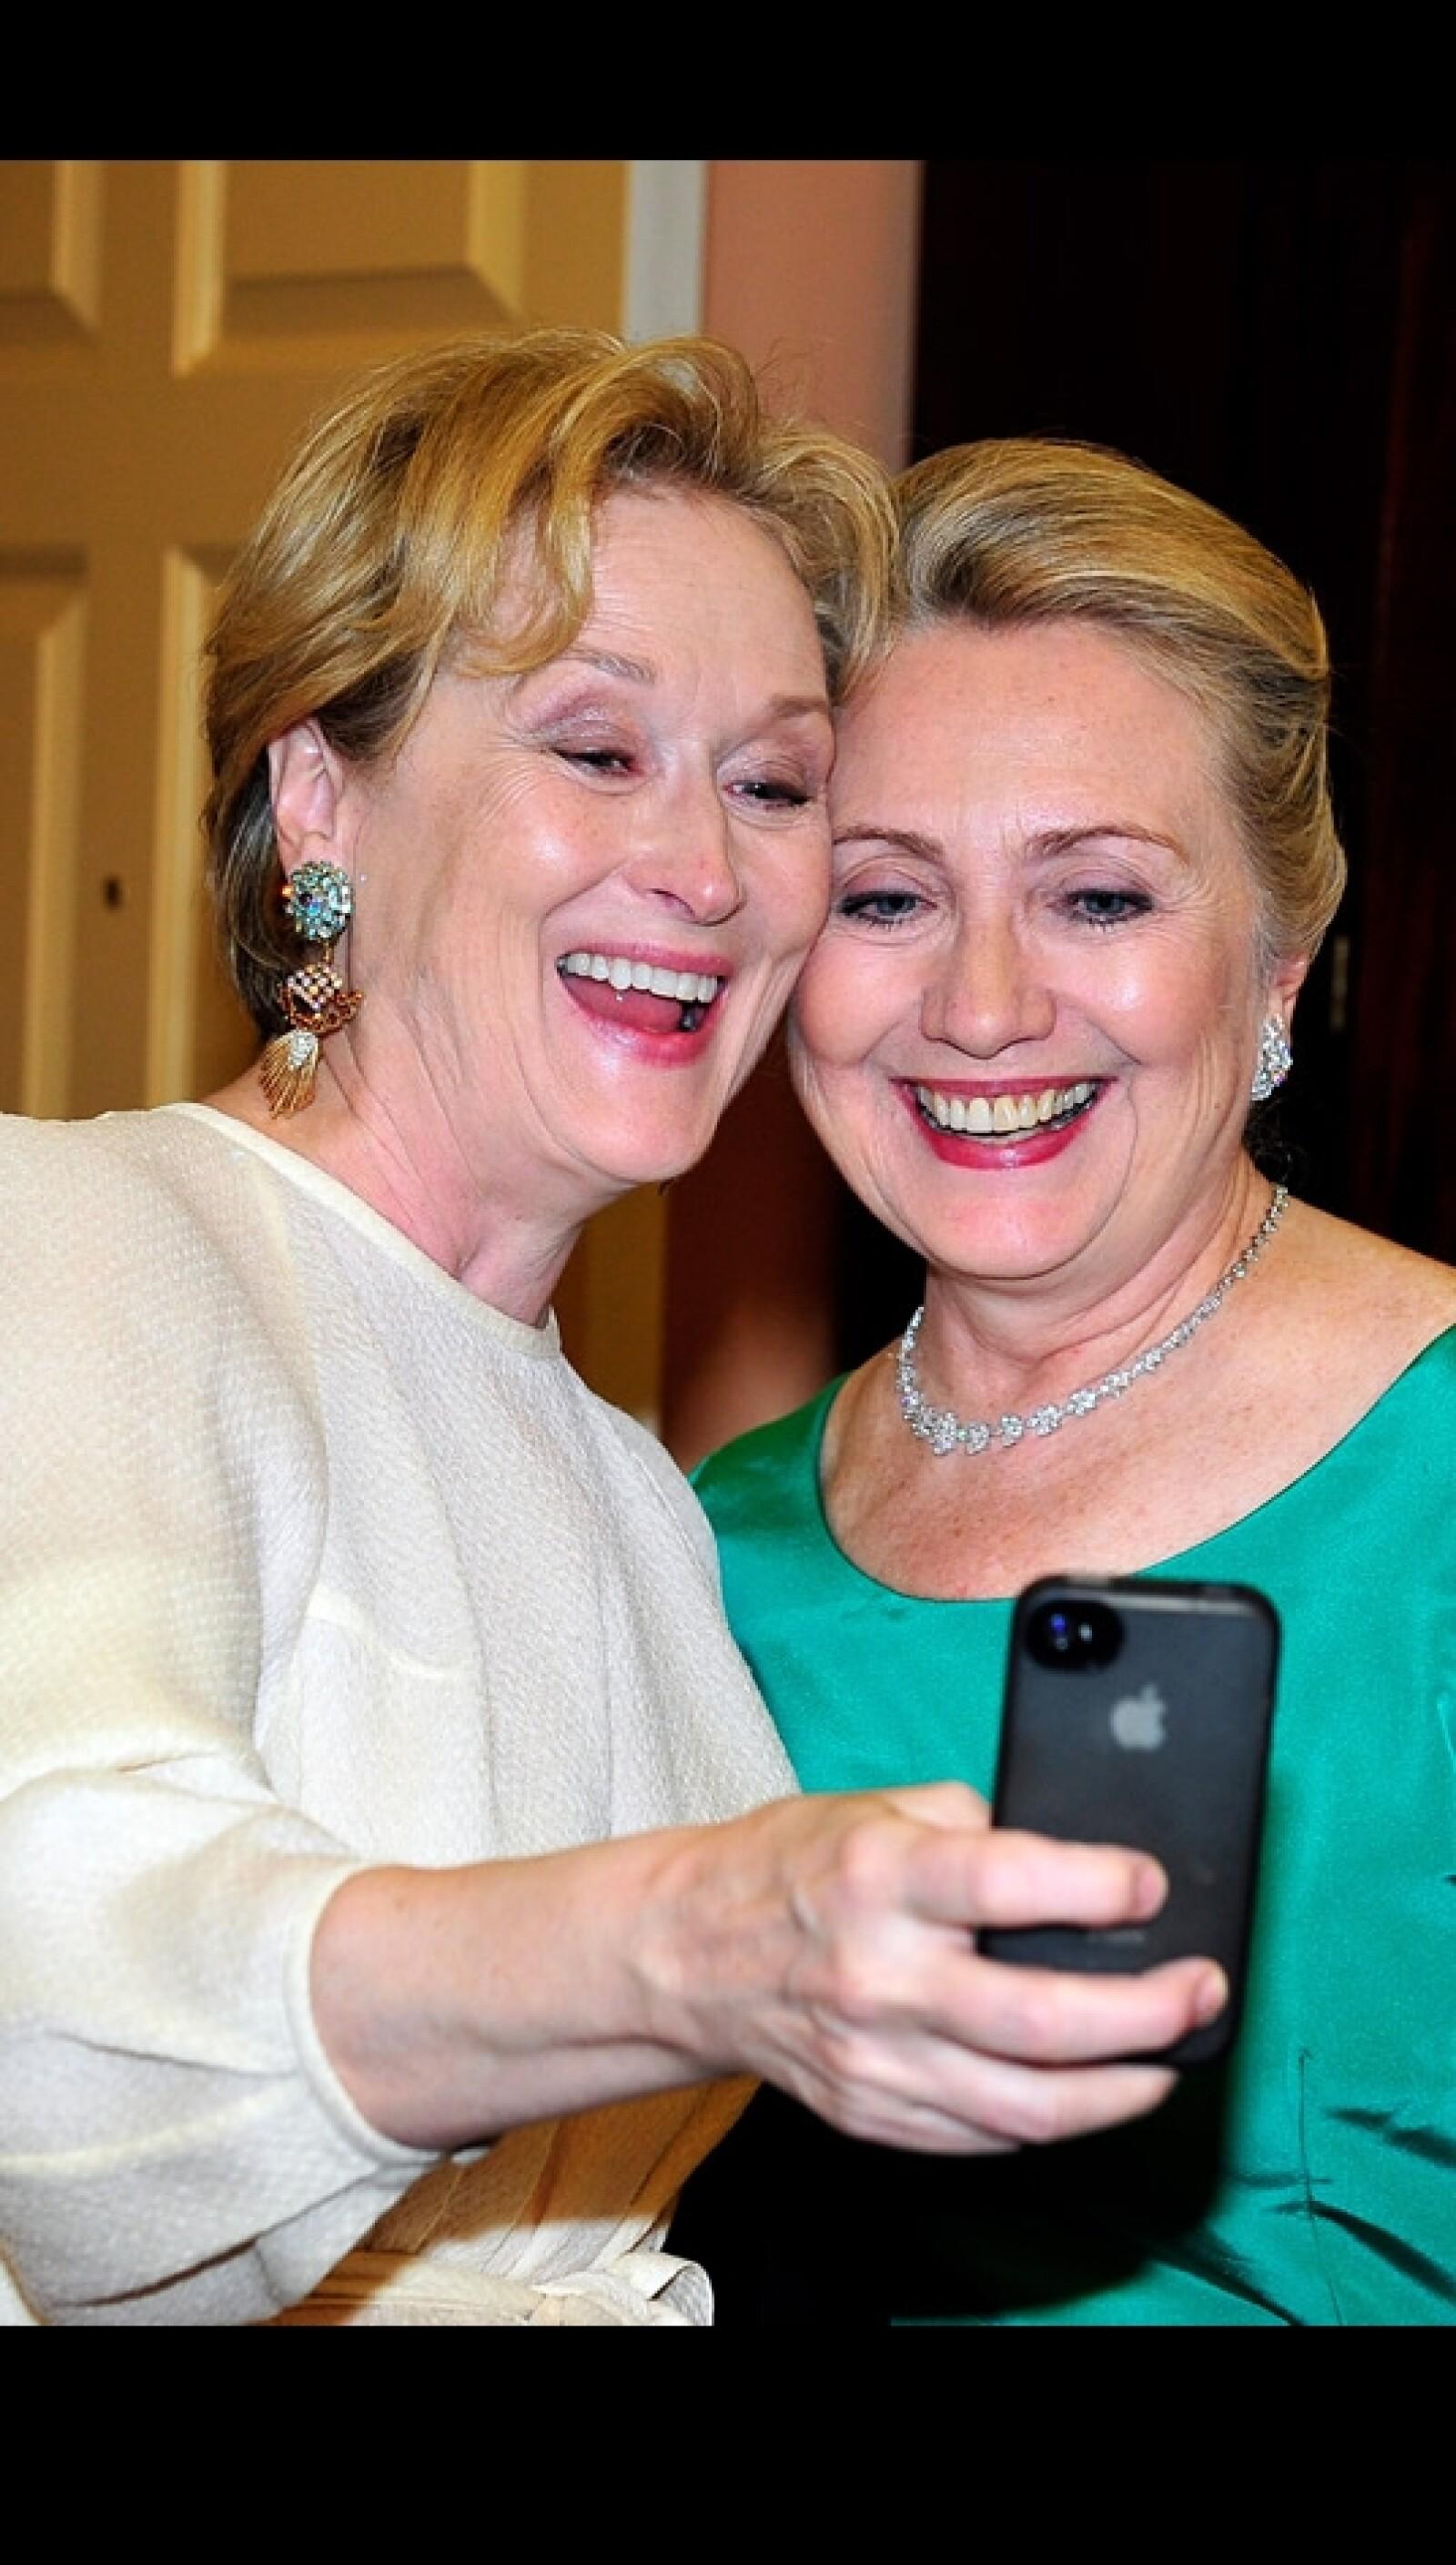 Meryl Streep y Hilary Clinton selfie